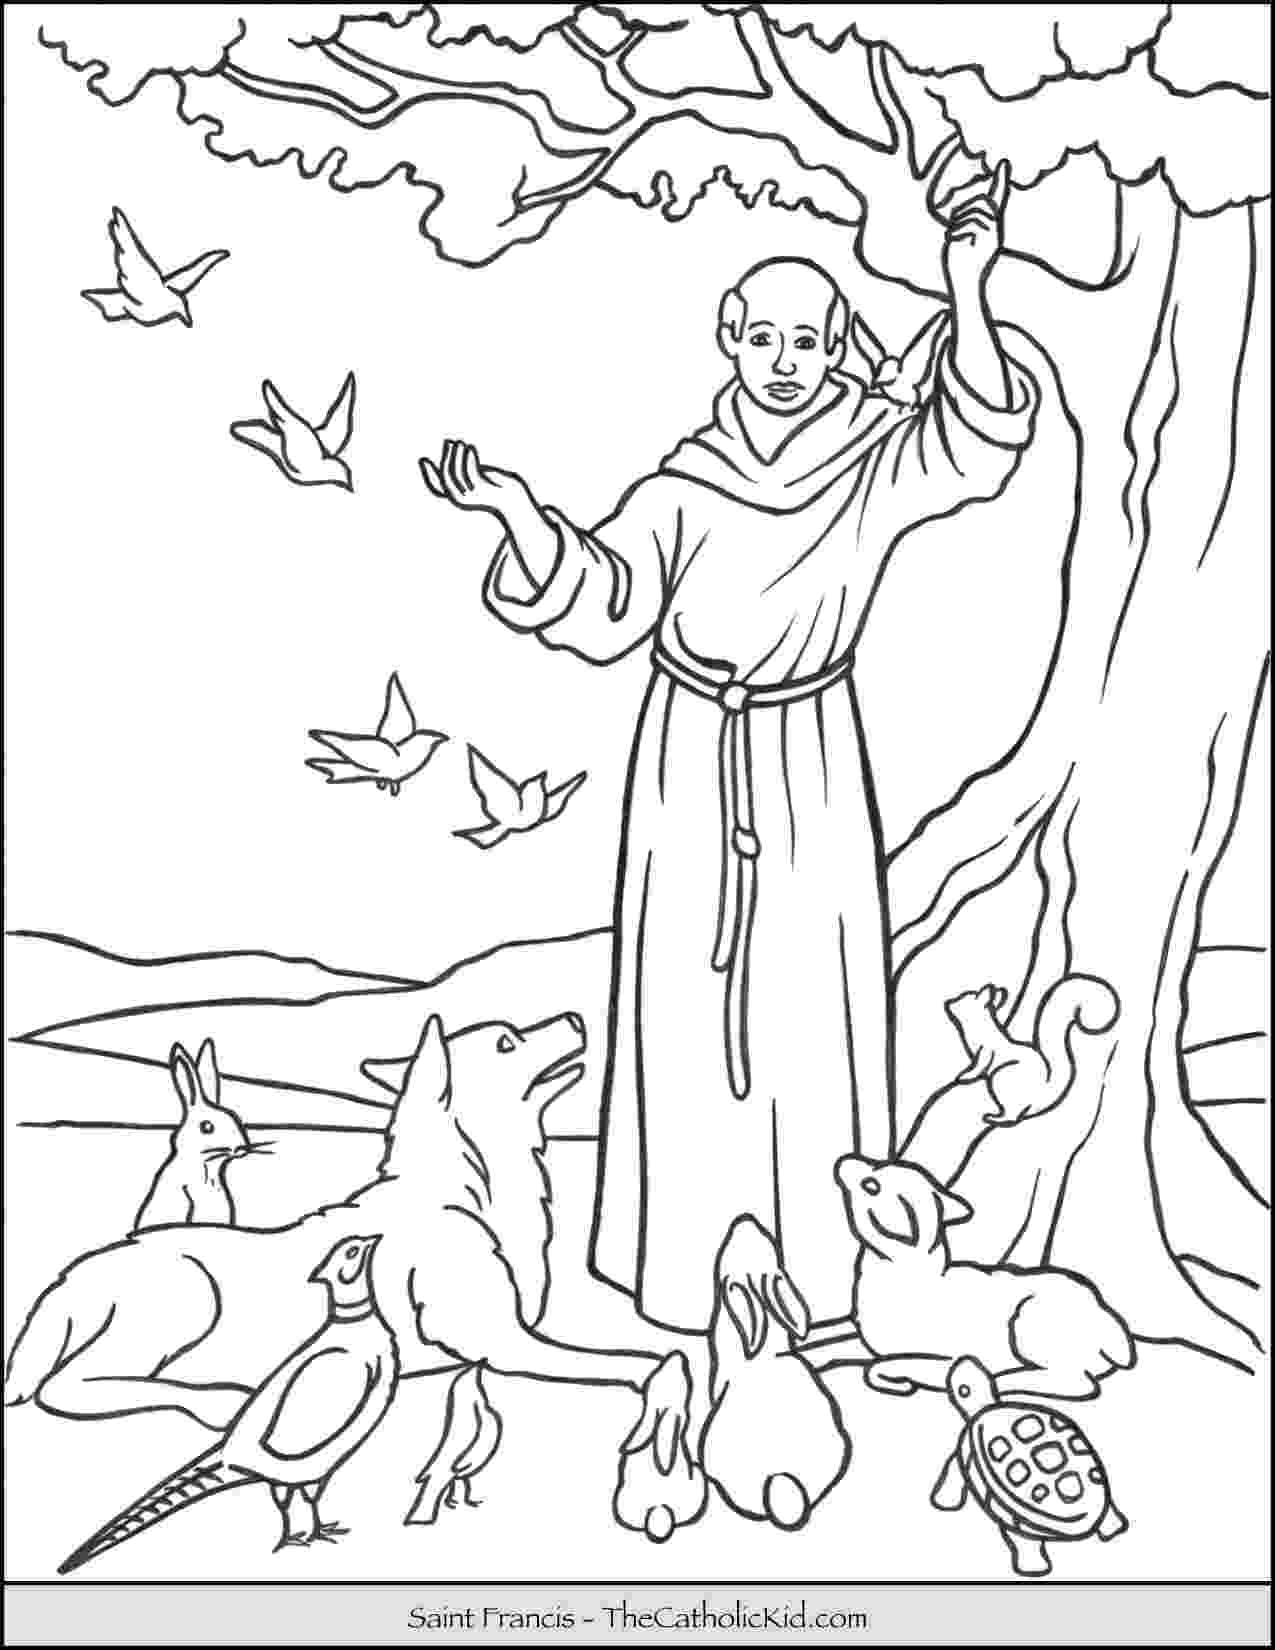 st francis coloring page saint francis blessing animals coloring page page francis coloring st